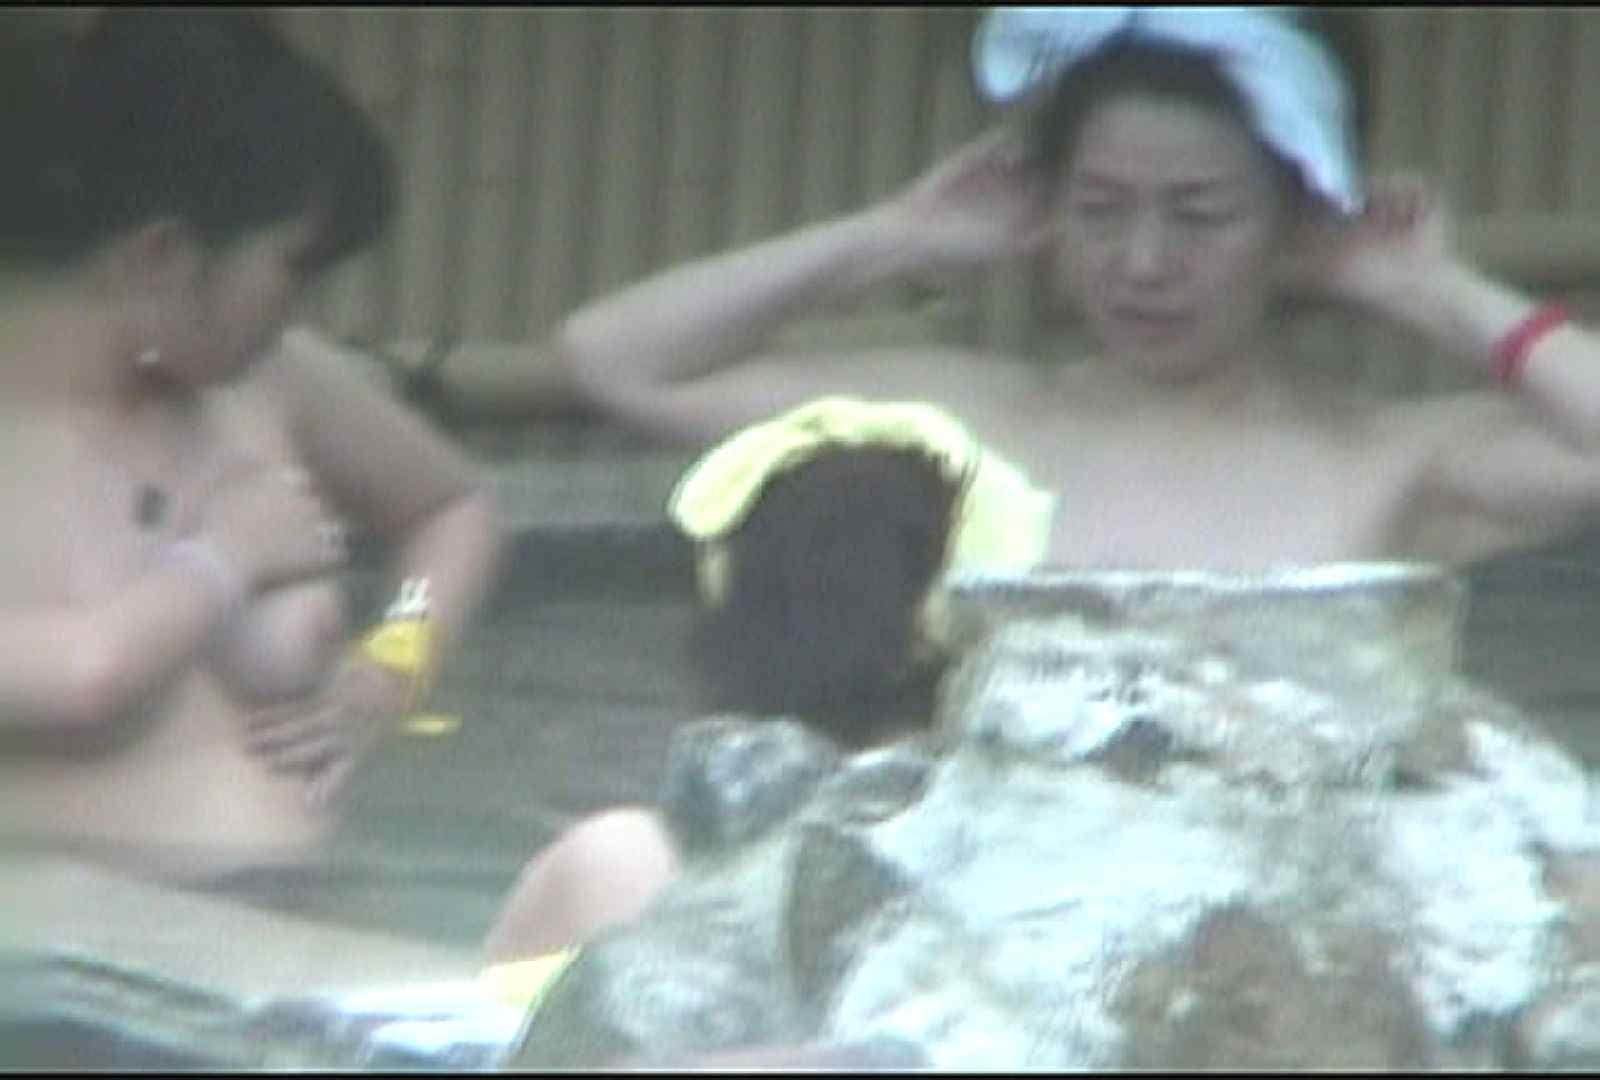 Aquaな露天風呂Vol.145 盗撮 | OLセックス  106画像 103